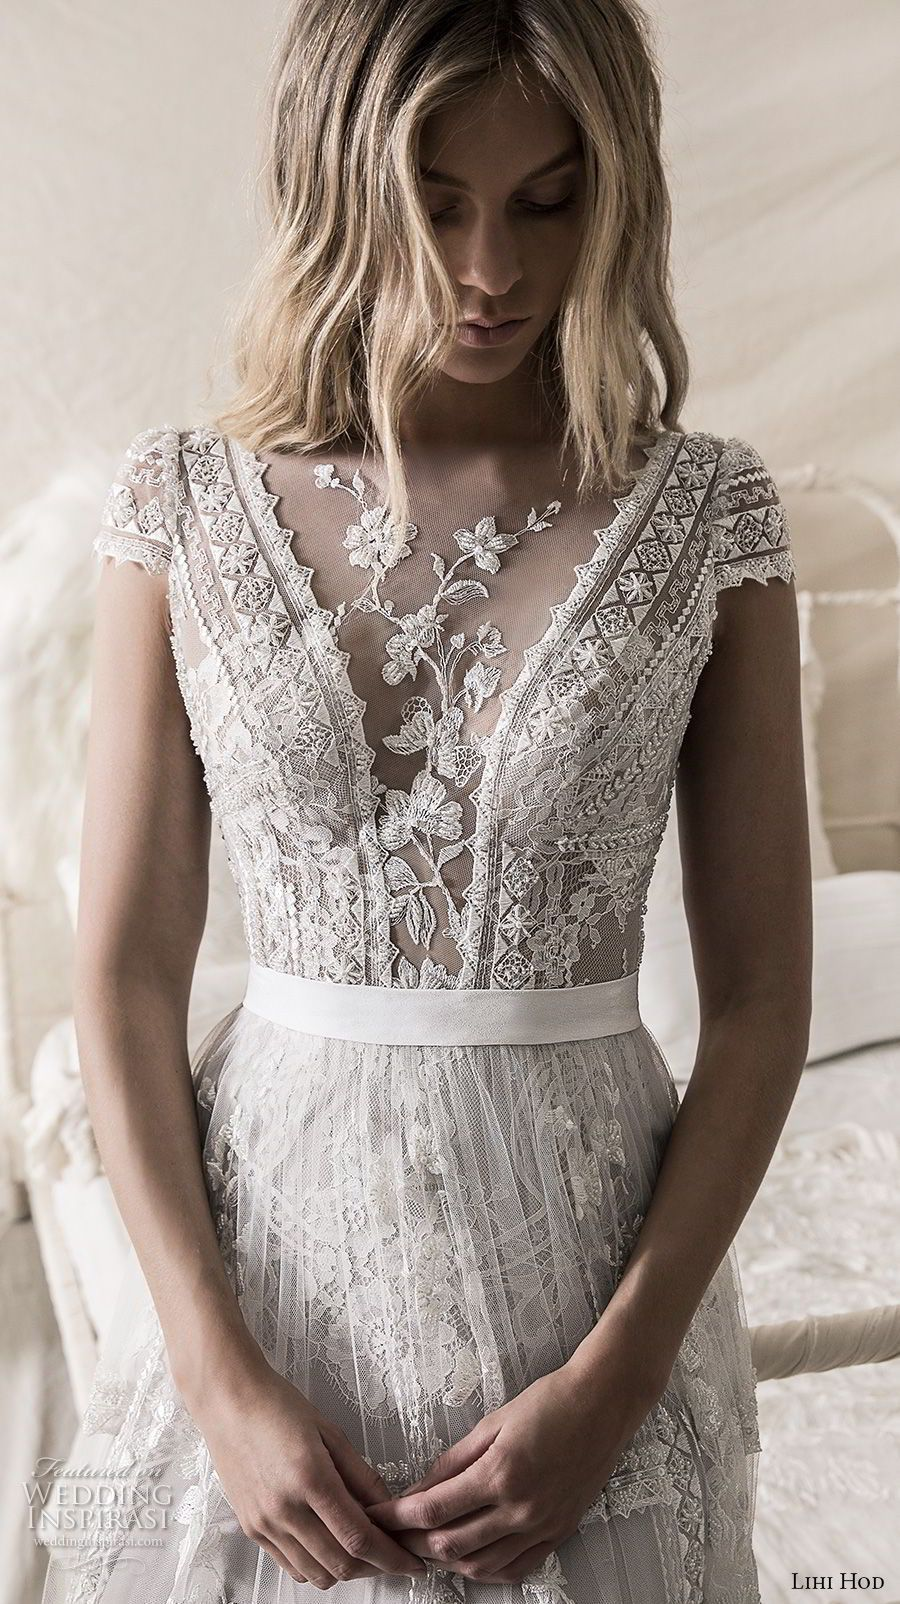 74c9430dc84 lihi hod 2018 bridal cap sleeves illusion jewel deep v neck heavily  embellised bodice romantic bohemian